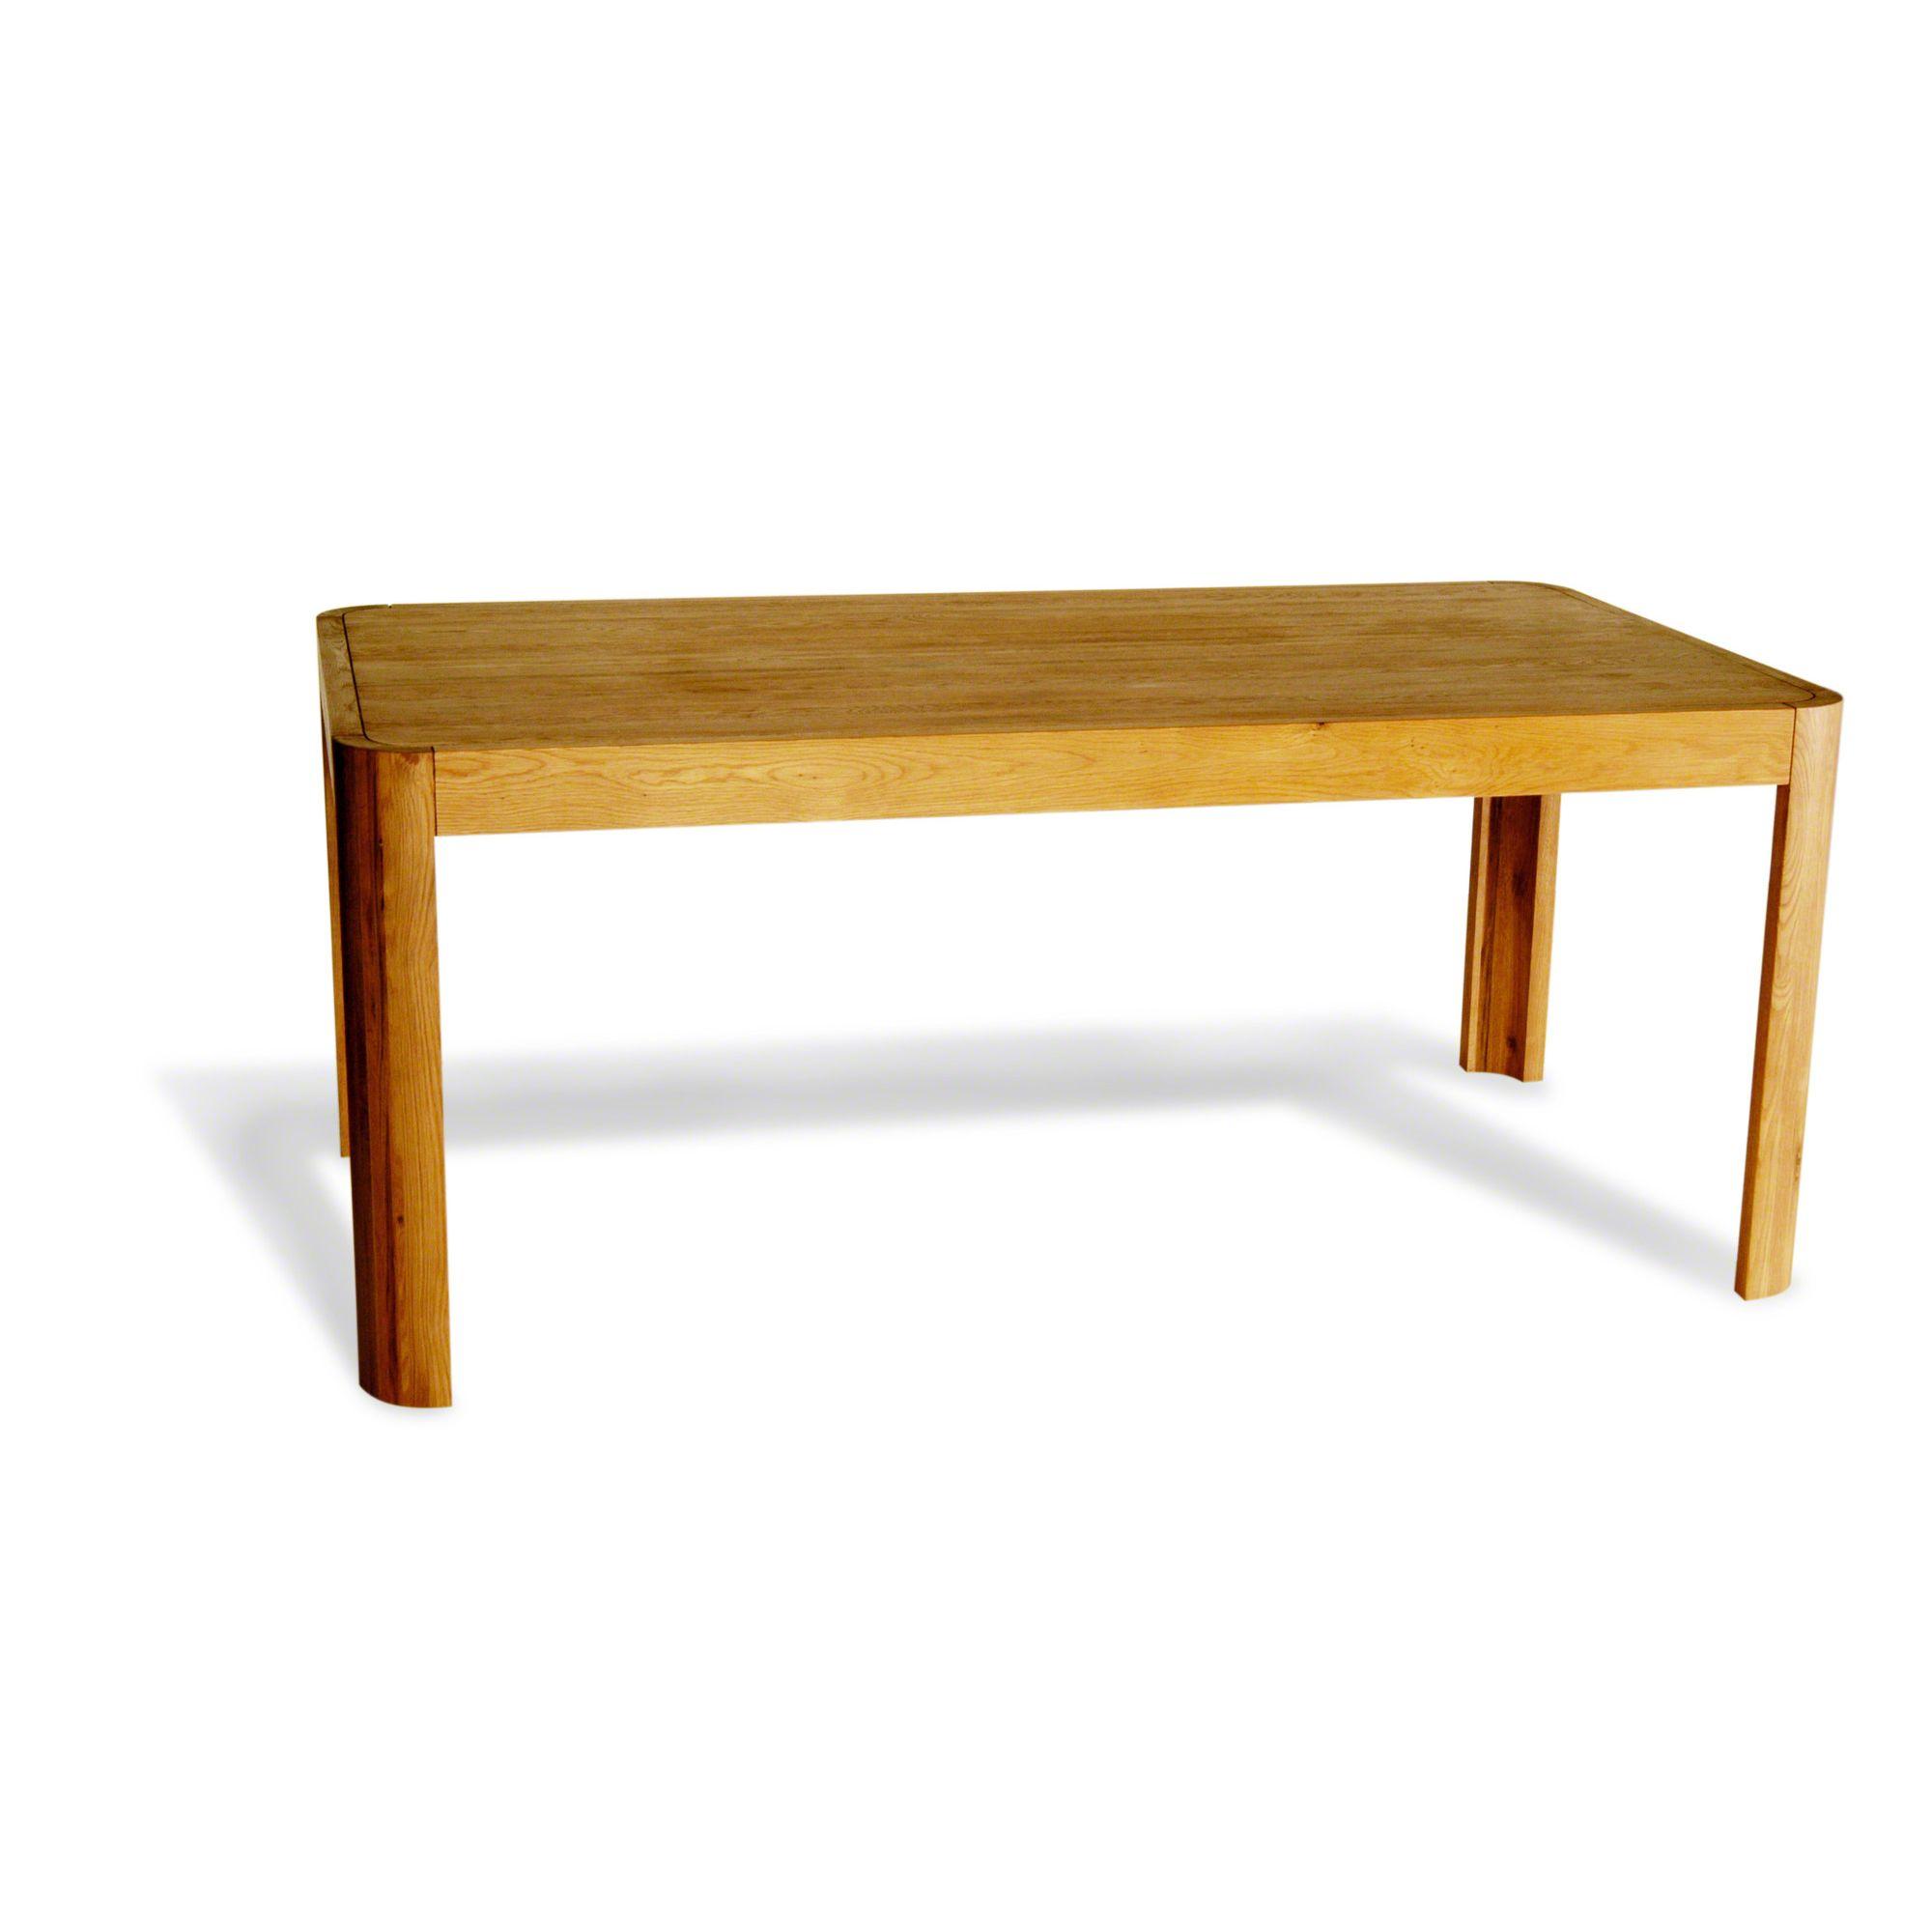 Oceans Apart Lounge Solid Oak Dining Table in Natural Oak - 180cm